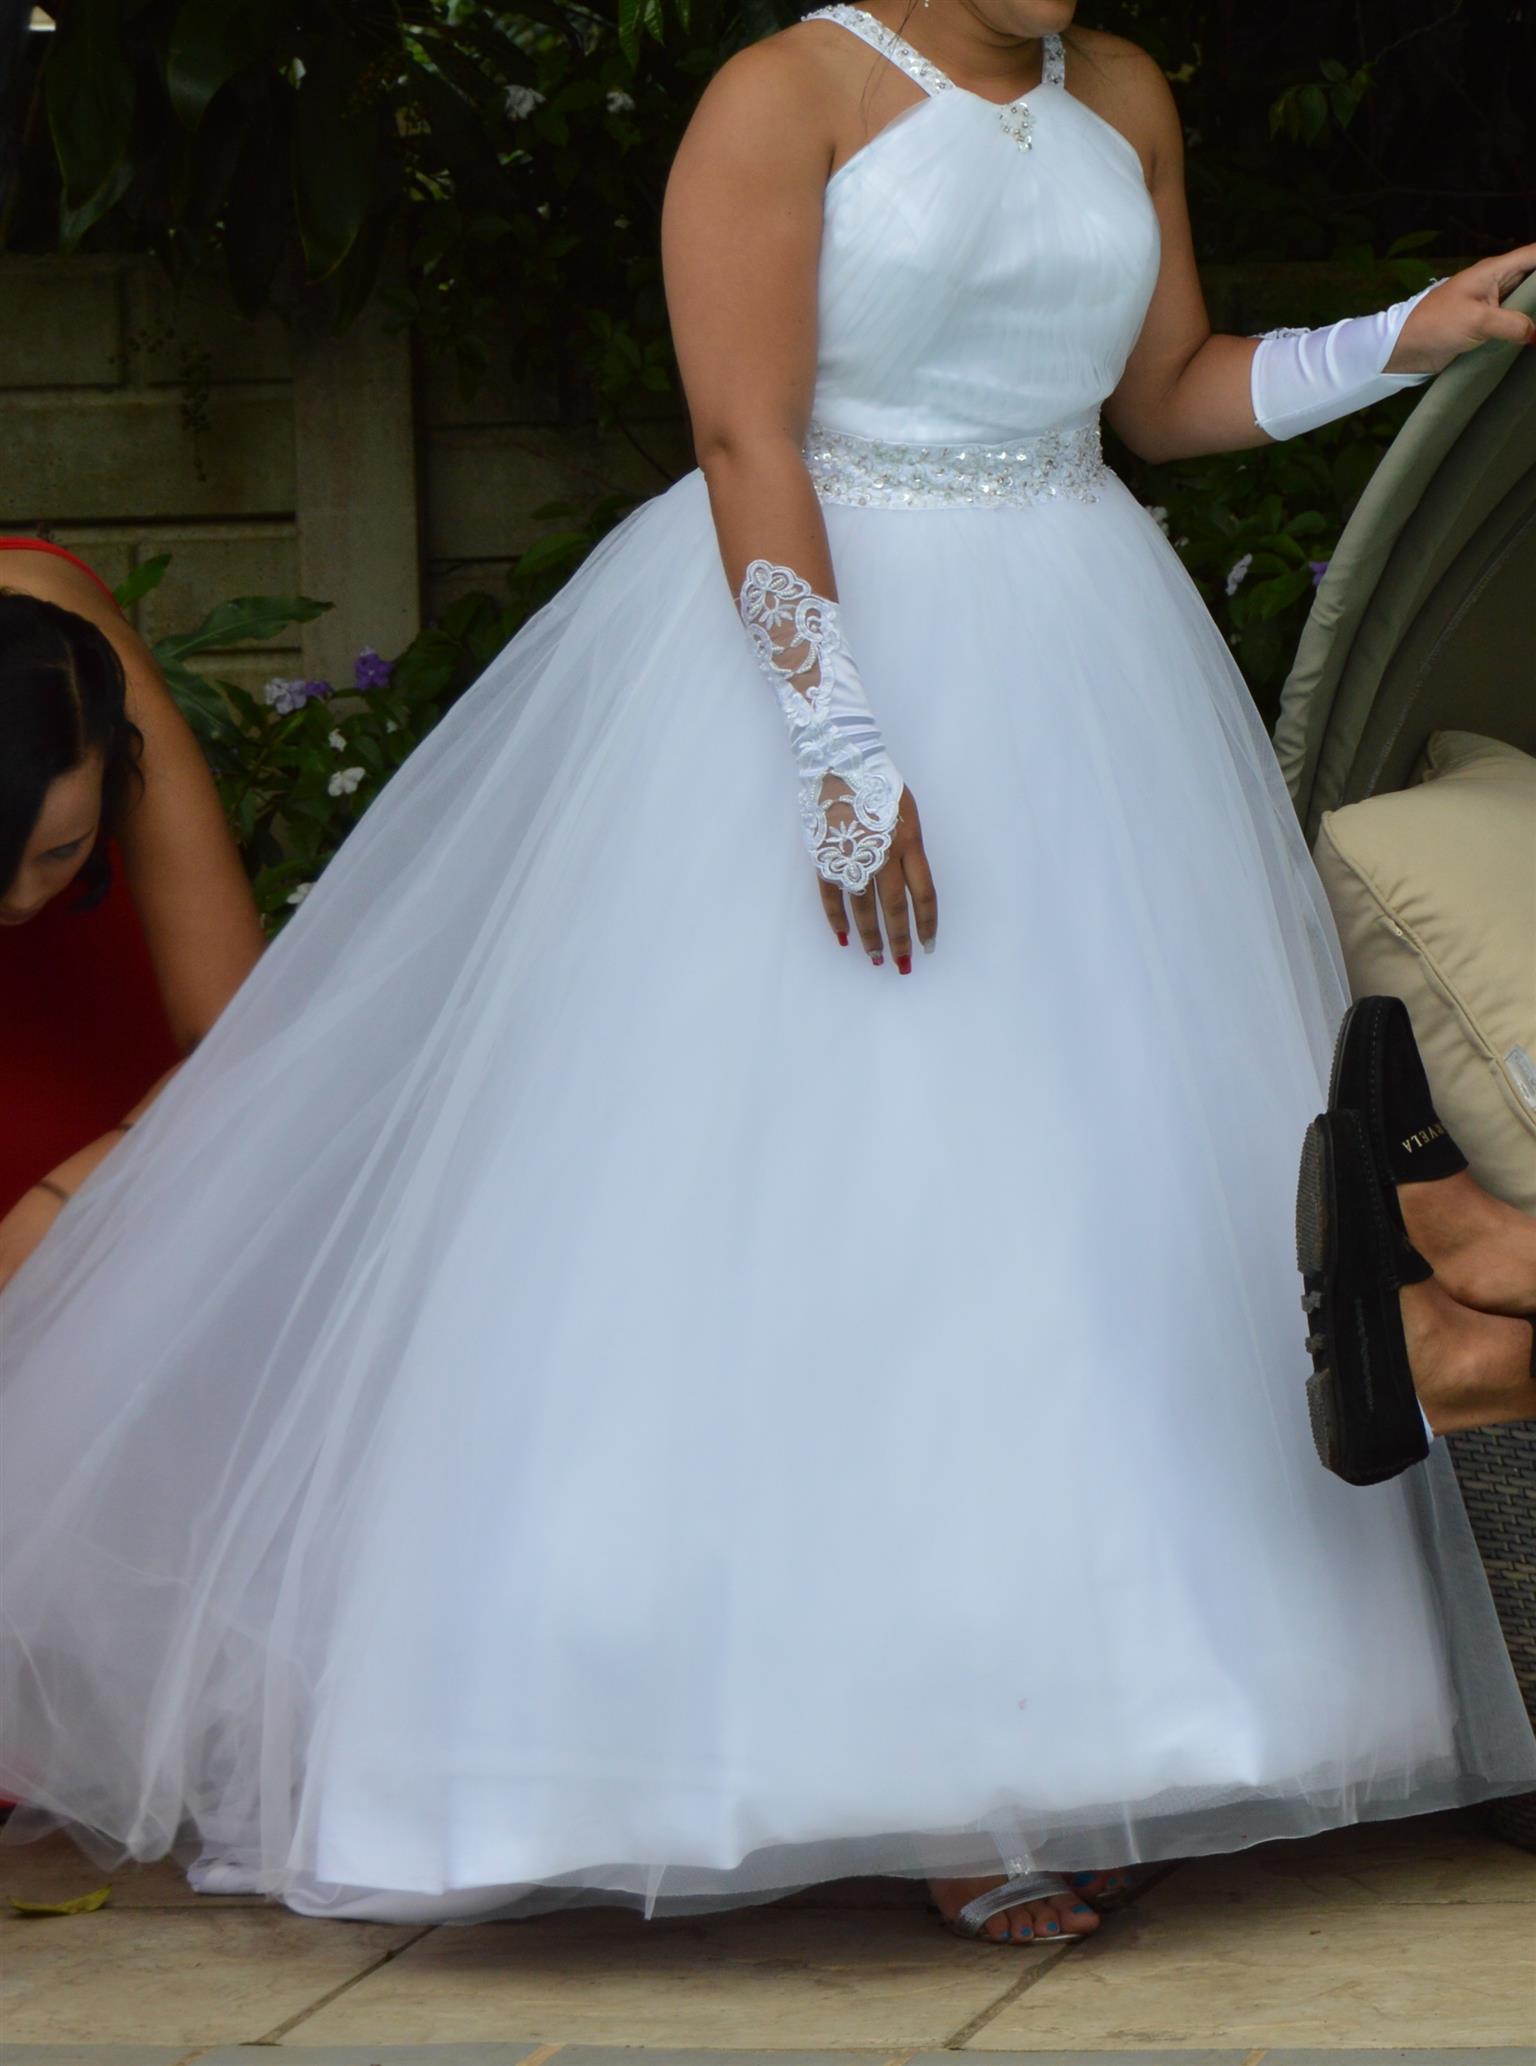 Nice Wedding Dress For Hire Crest - Wedding Plan Ideas ...